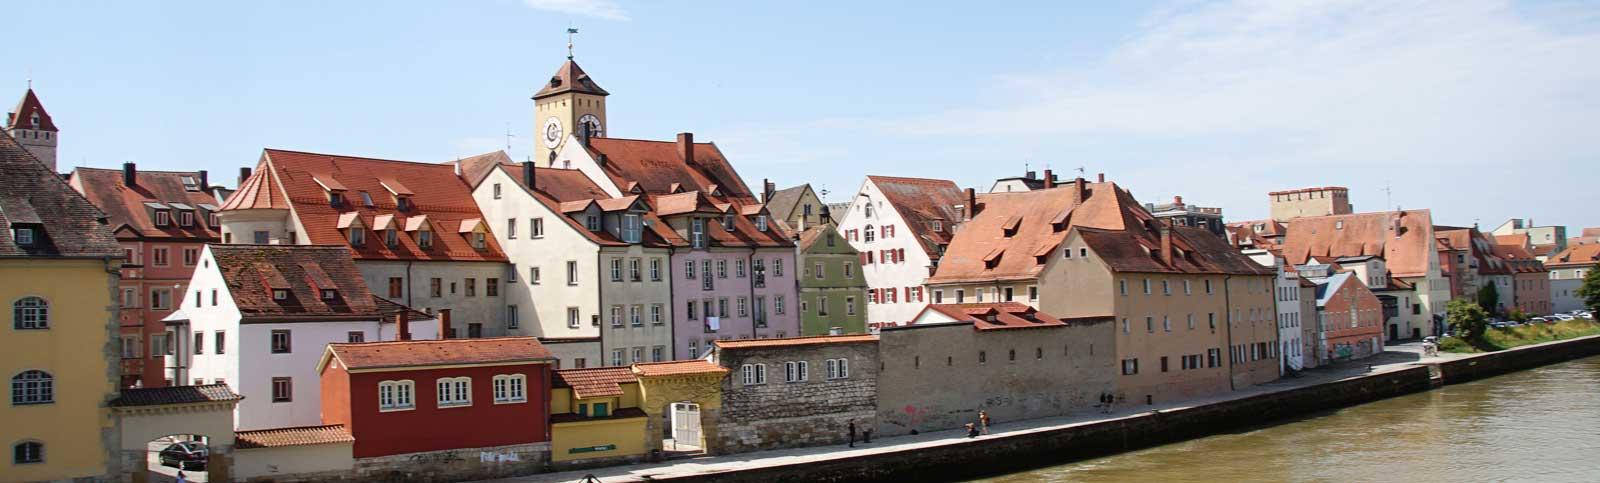 Regensburg an der Donau